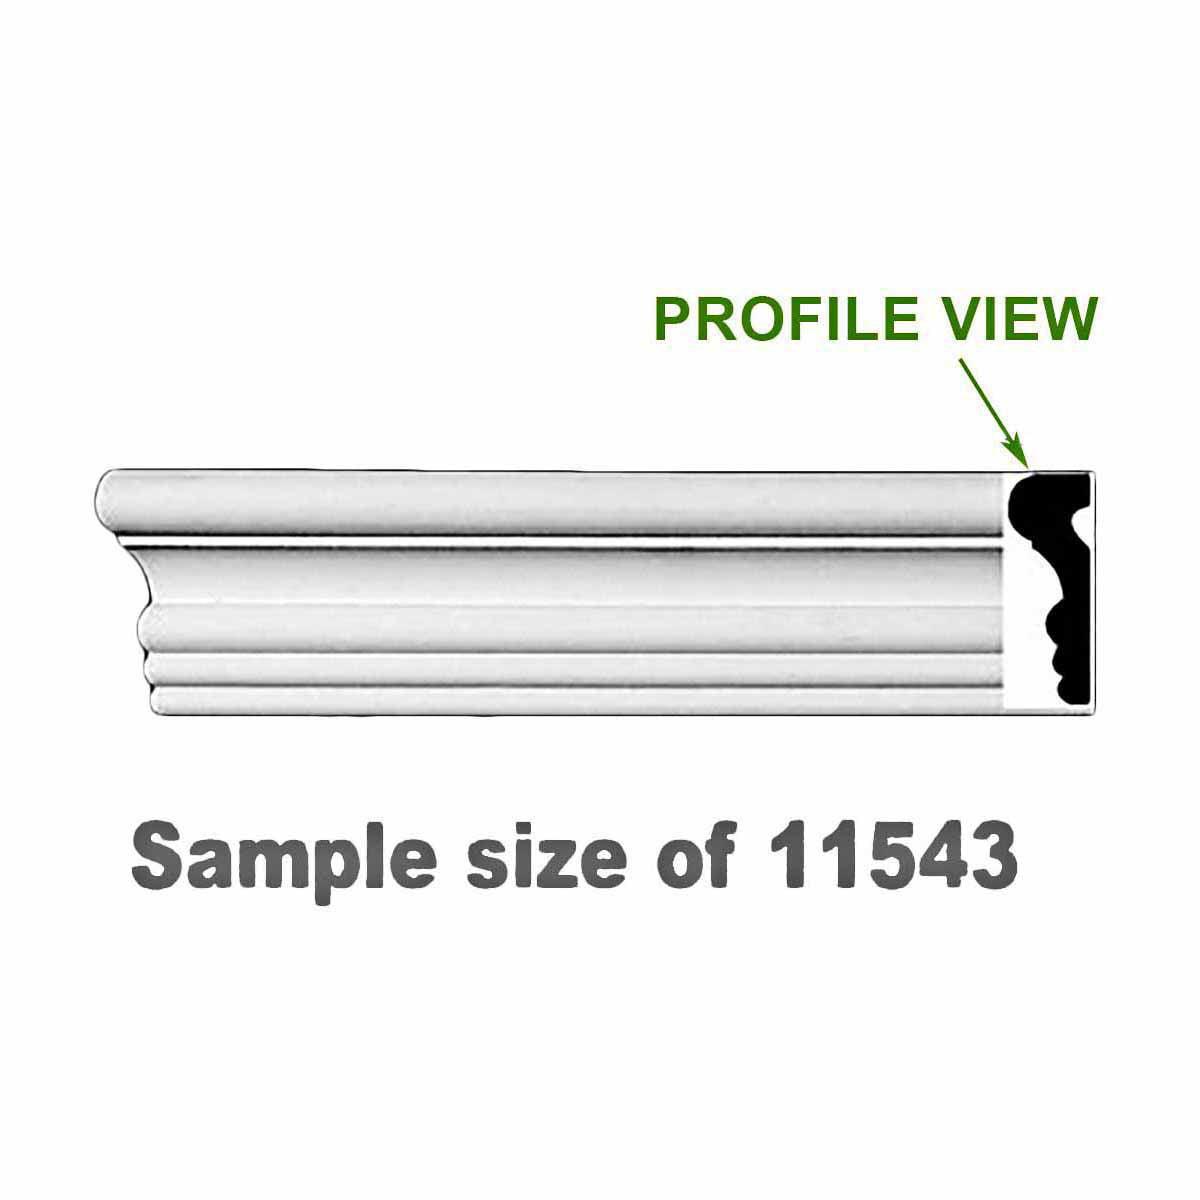 "Cornice White Urethane Sample of 11543 24"" Long | Renovator's Supply"